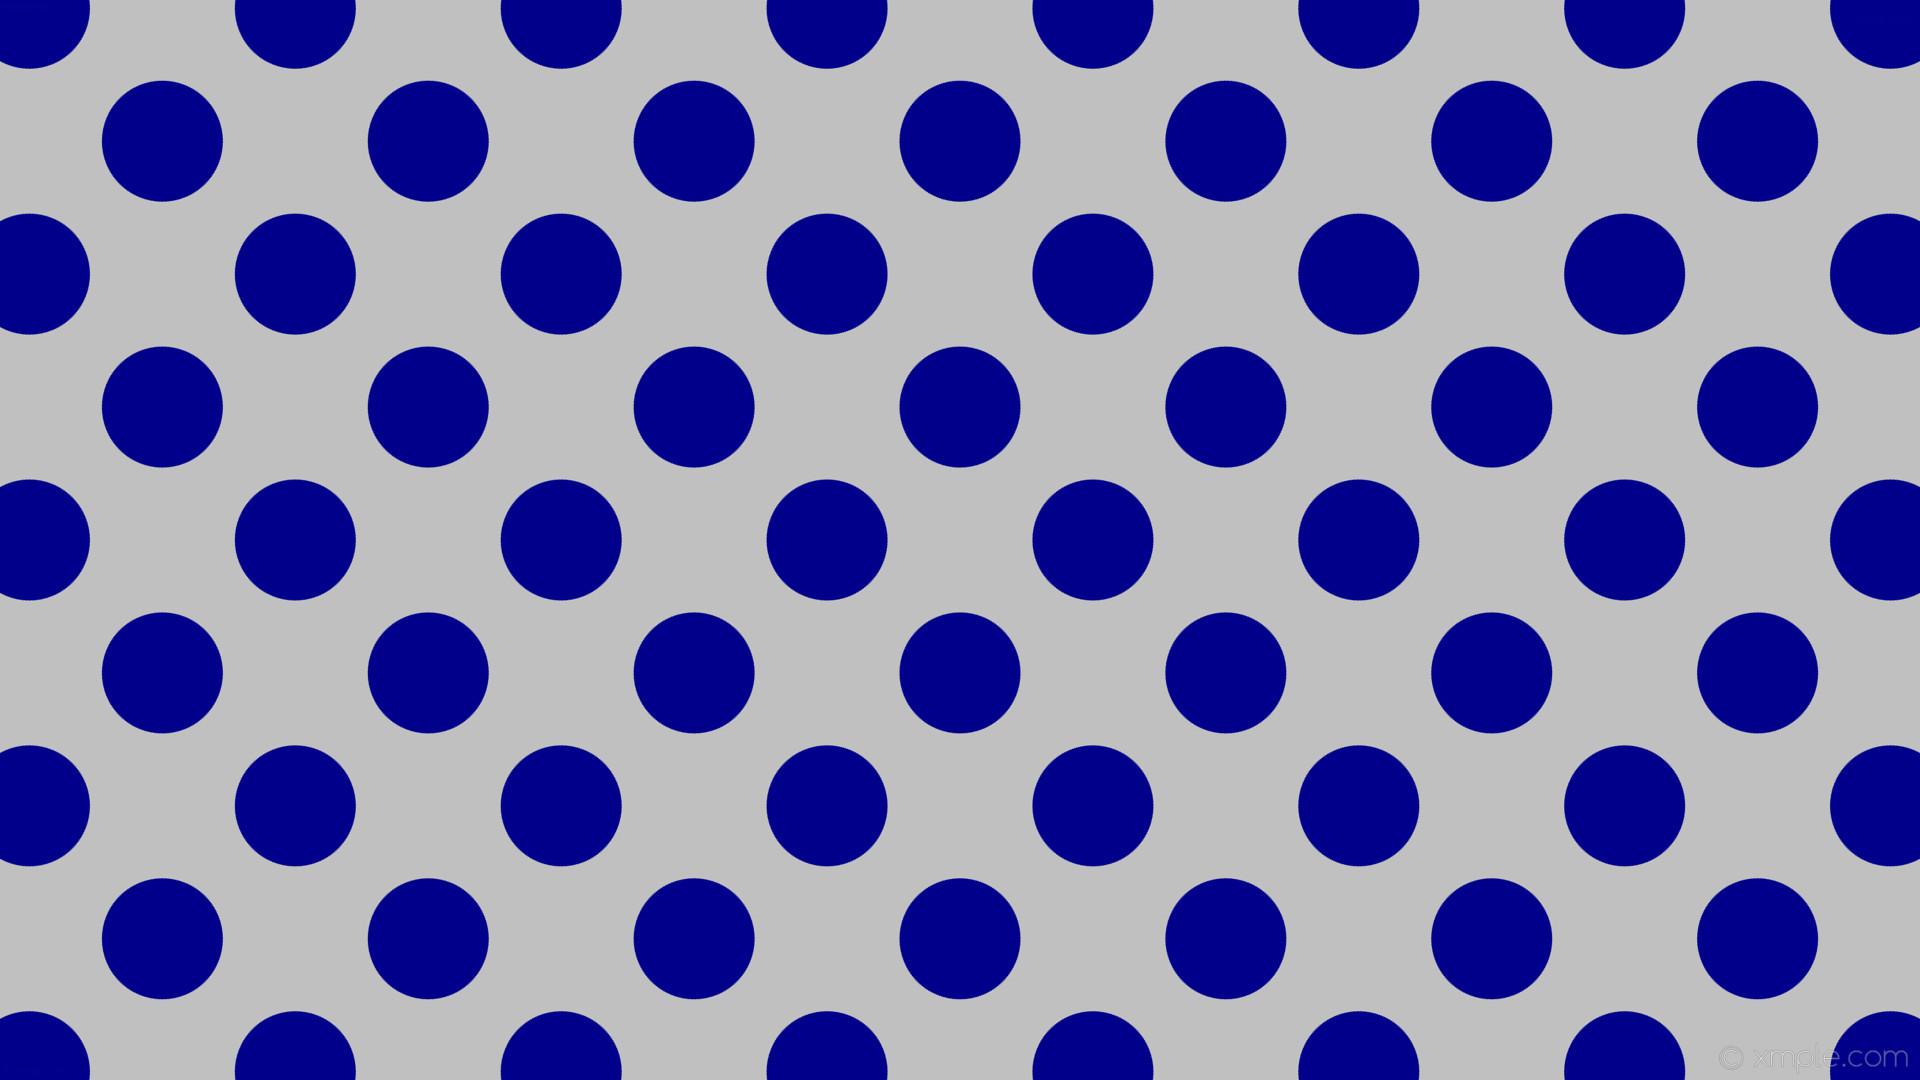 wallpaper polka dots spots blue grey silver dark blue #c0c0c0 #00008b 45°  121px